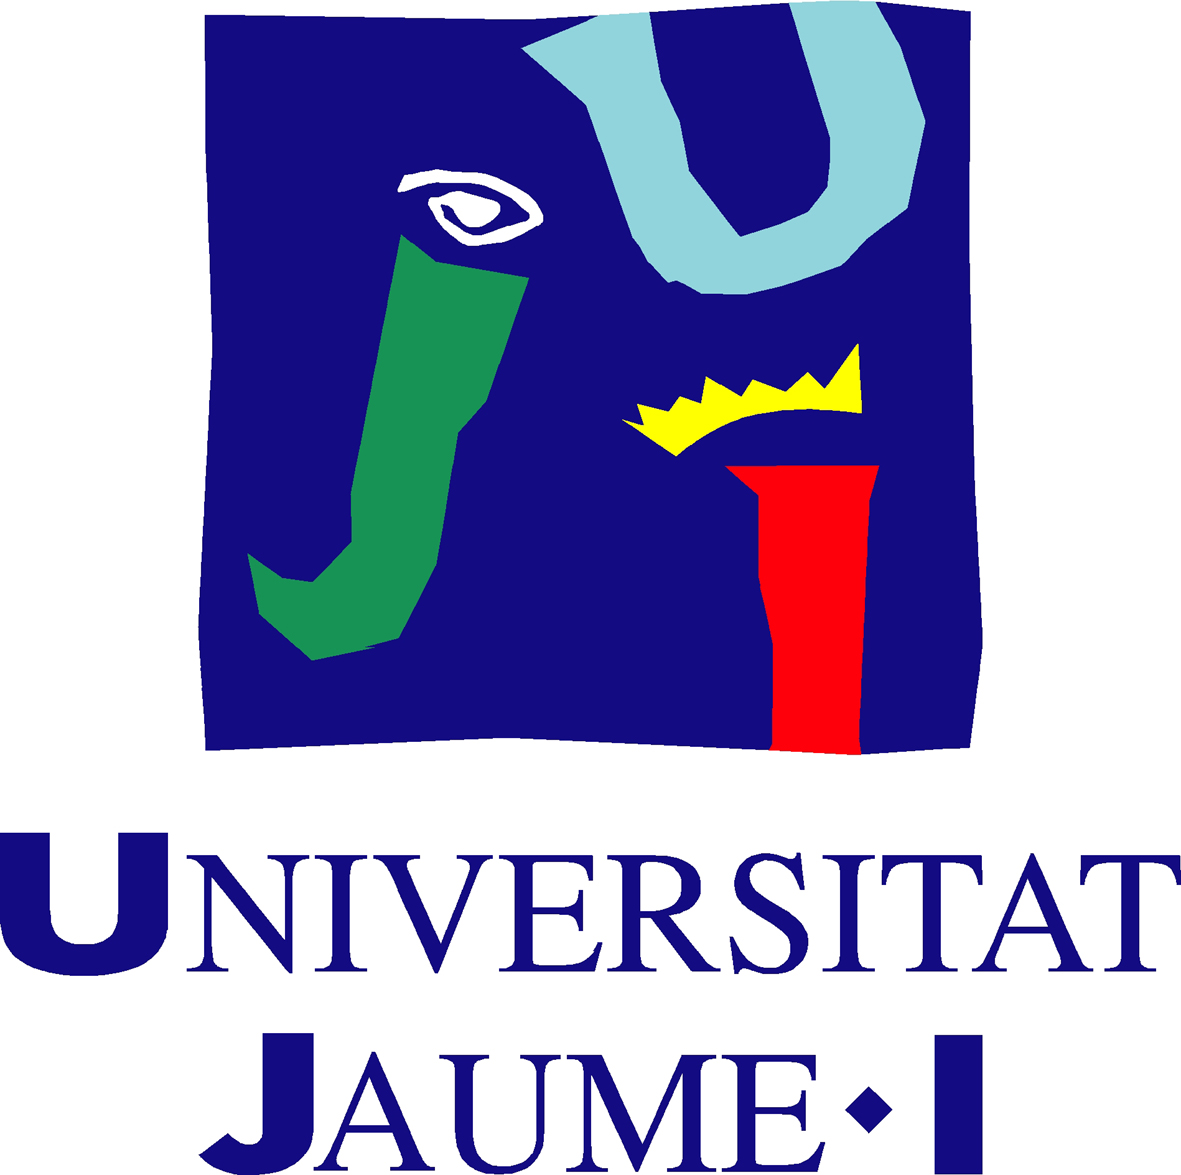 La Universidad Jaume I oferta 750 plazas Erasmus